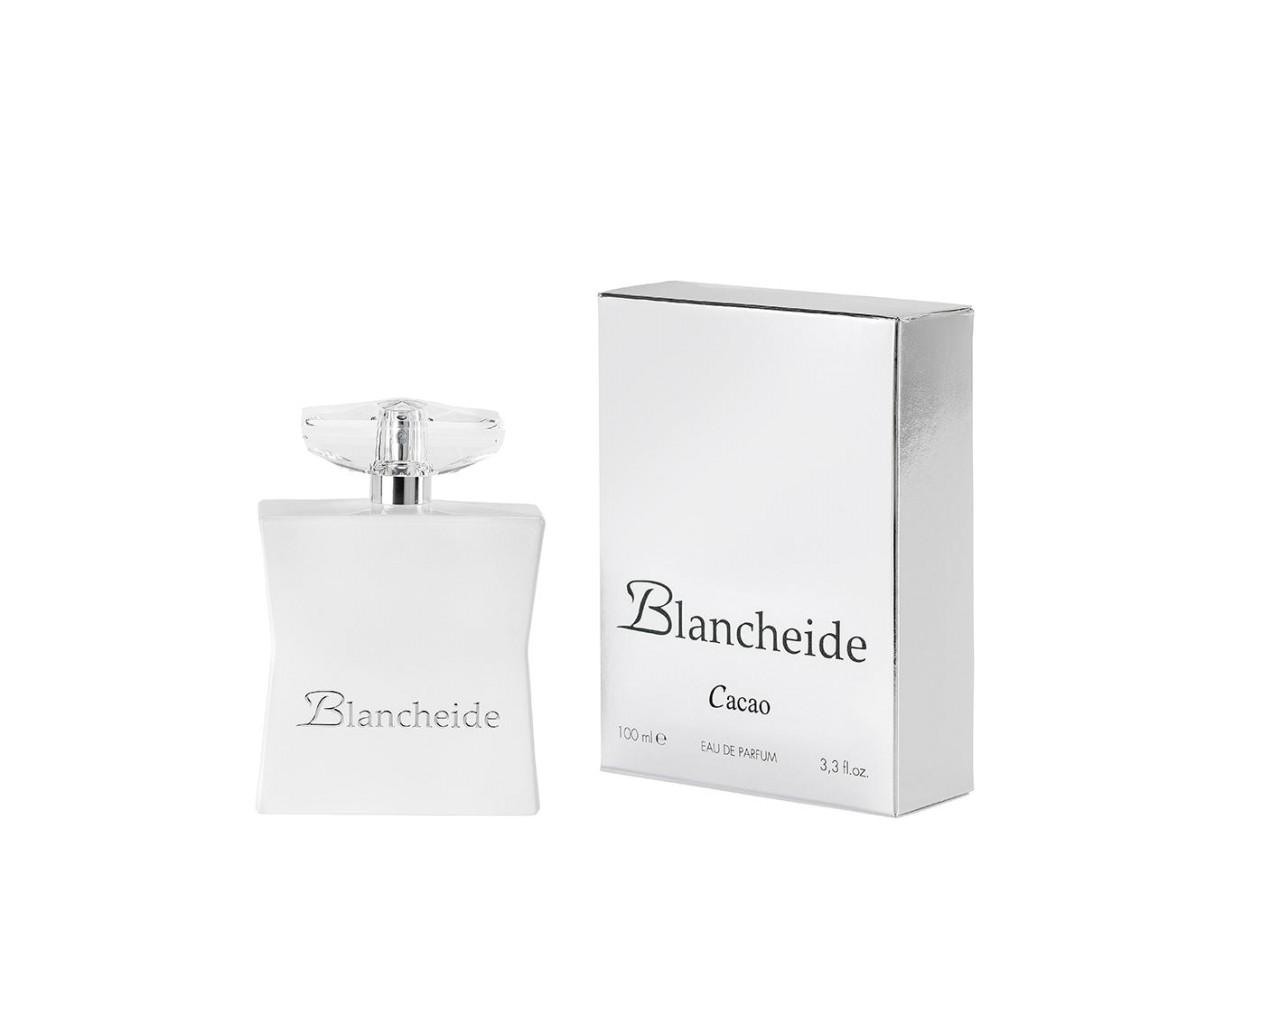 CACAO BLANCHEIDE EDP 100 ML Blancheide BLAV100CA-01